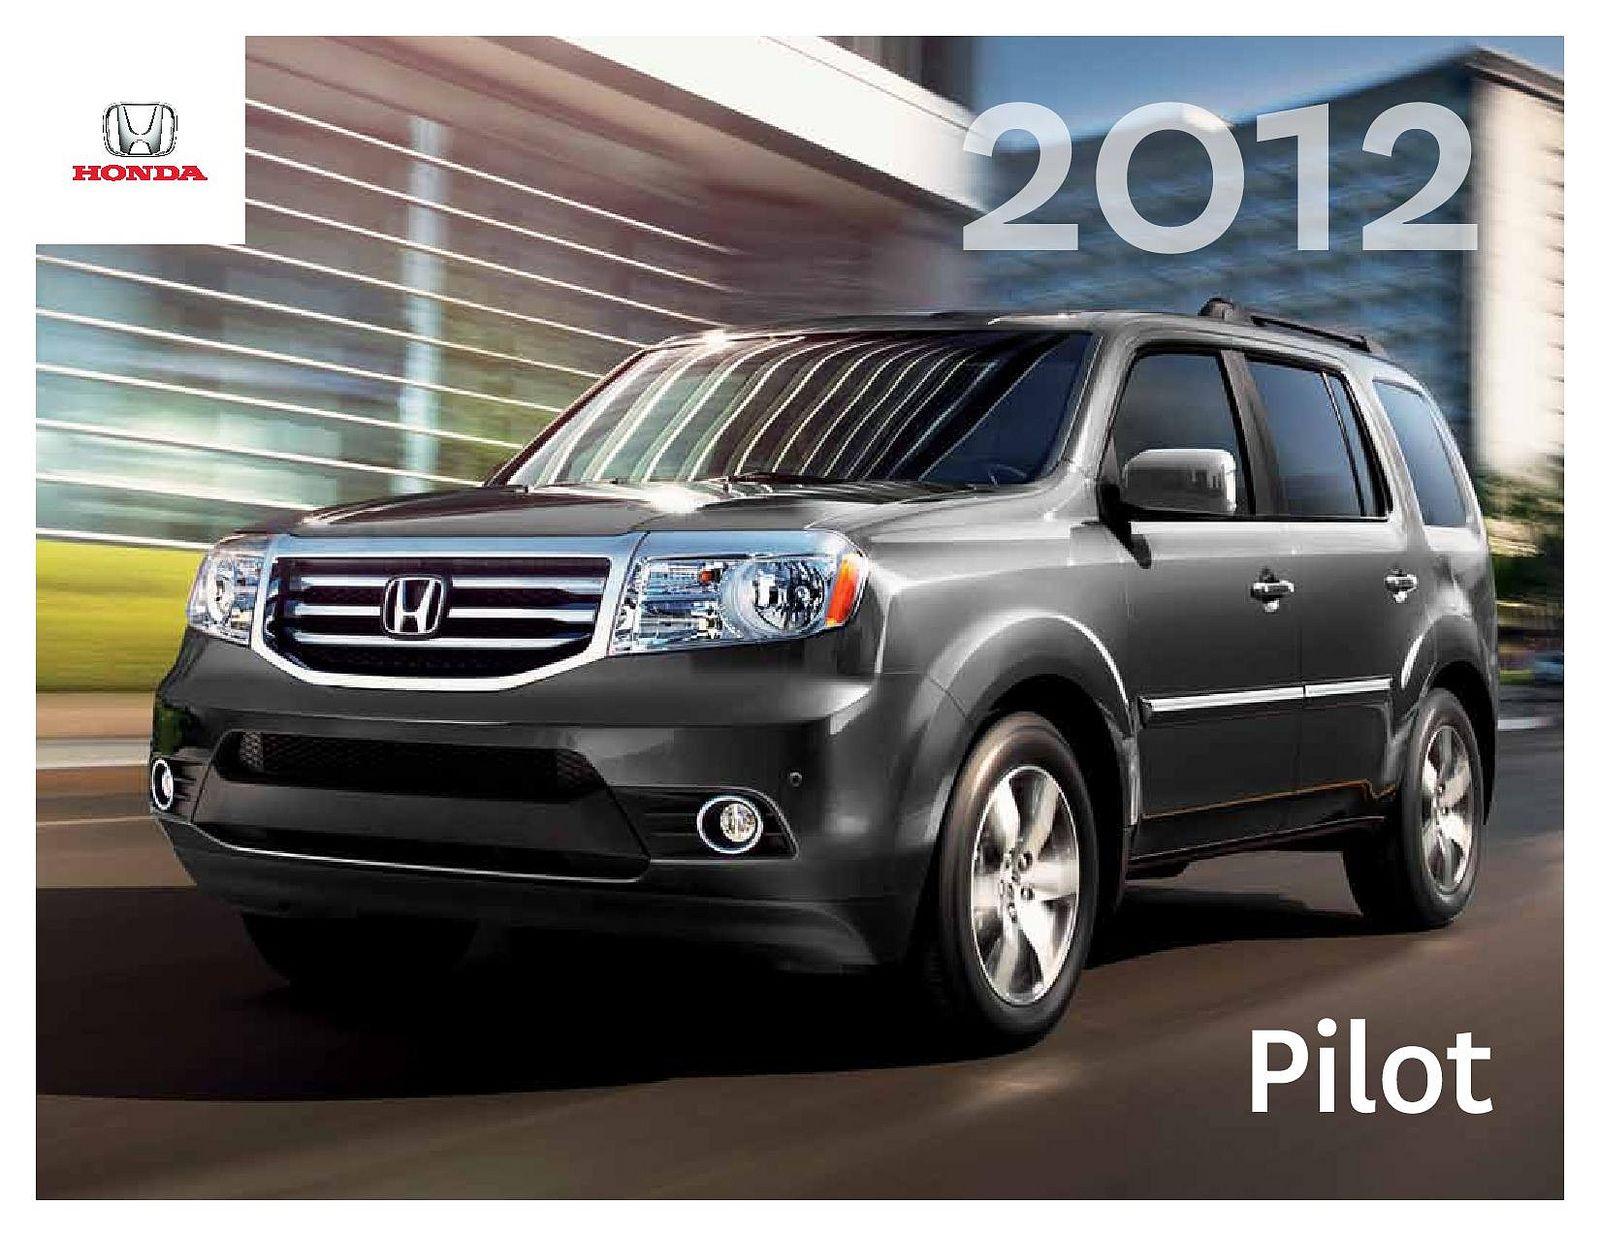 Honda Pilot Mk2 Canada Brochure 2012